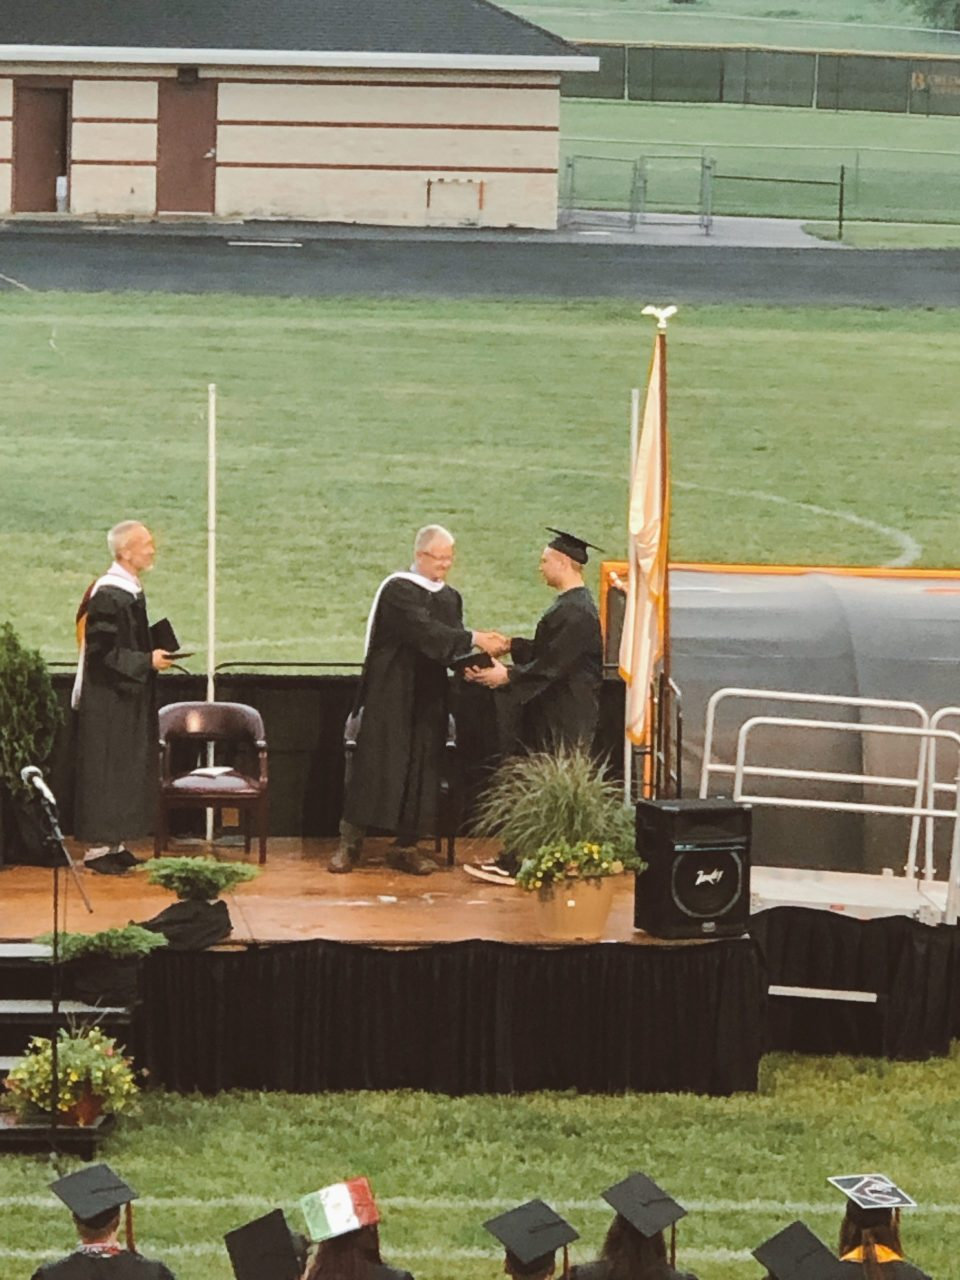 senior receiving diploma at graduation ceremony